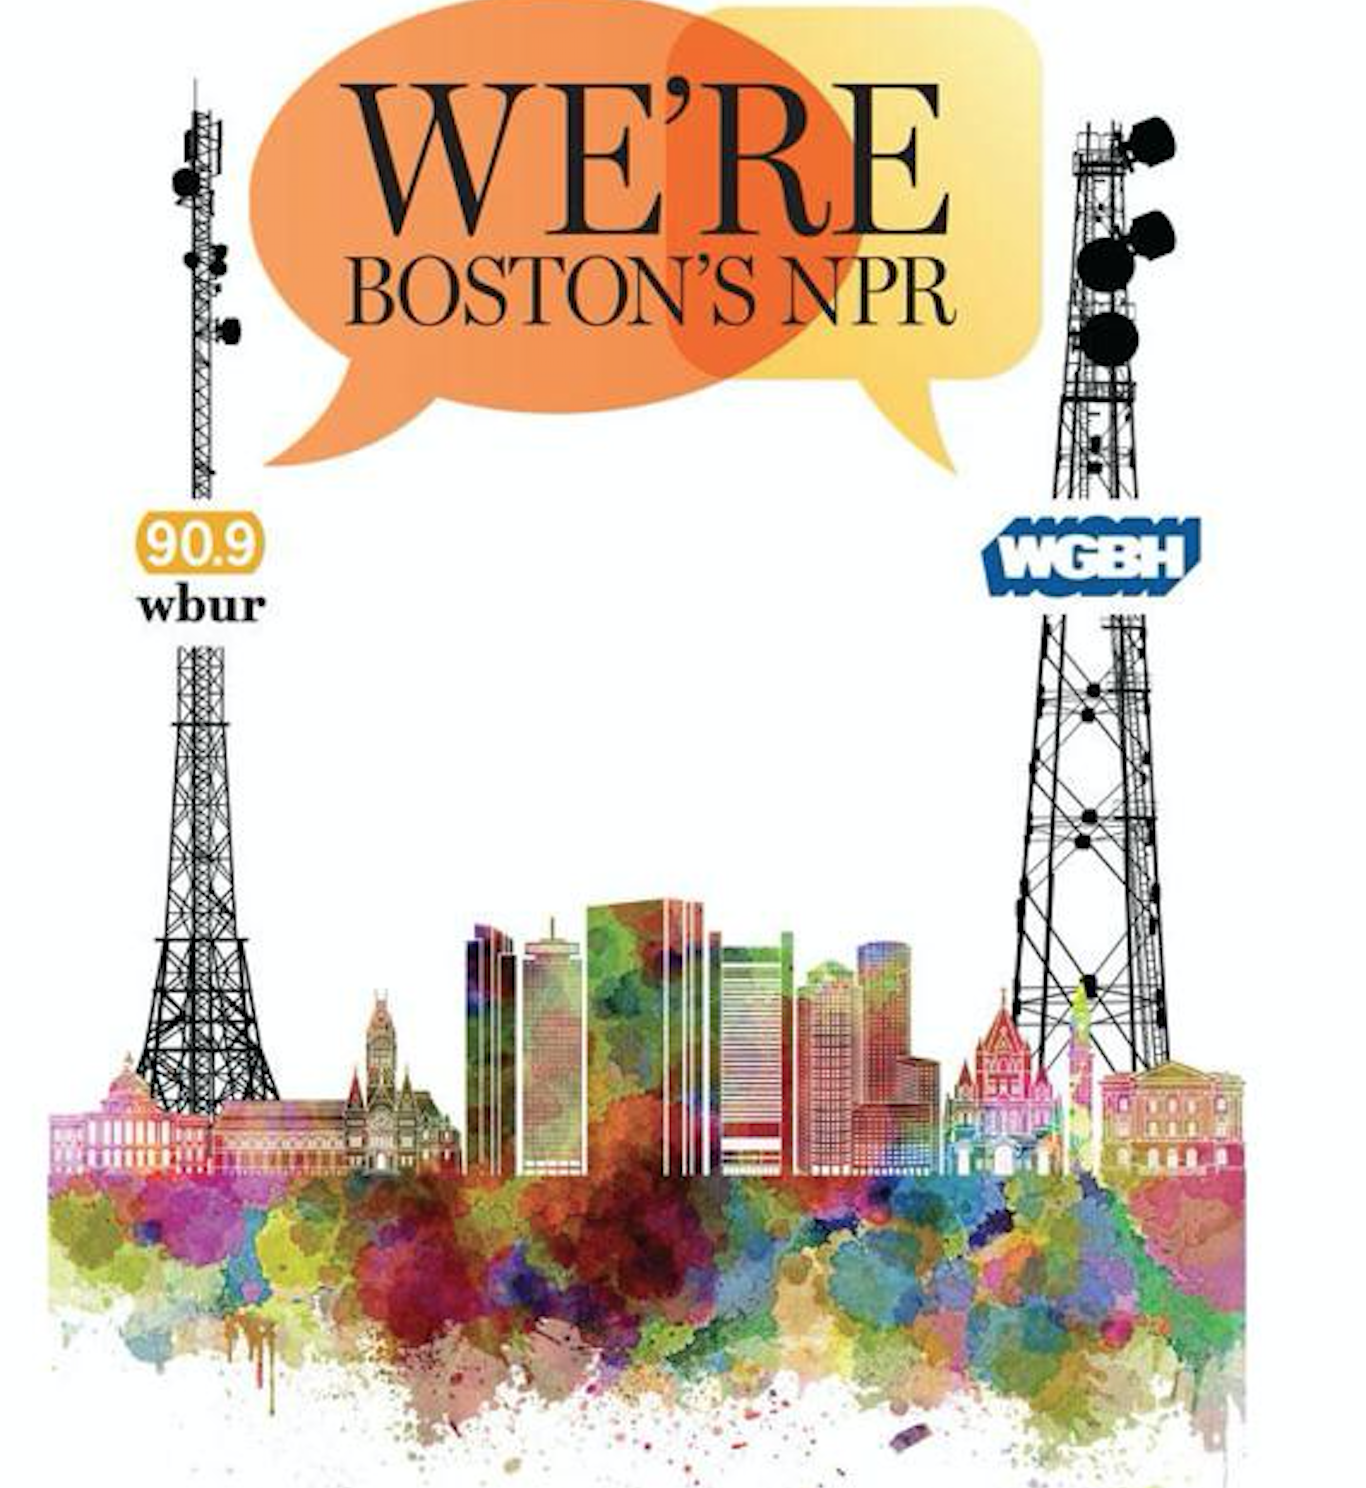 wxnf and boston radio wars [188016] vcxluuykqjiukgm 投稿者:christian smokers 投稿日:2009/02/26(thu) 05:36  comment2,   .